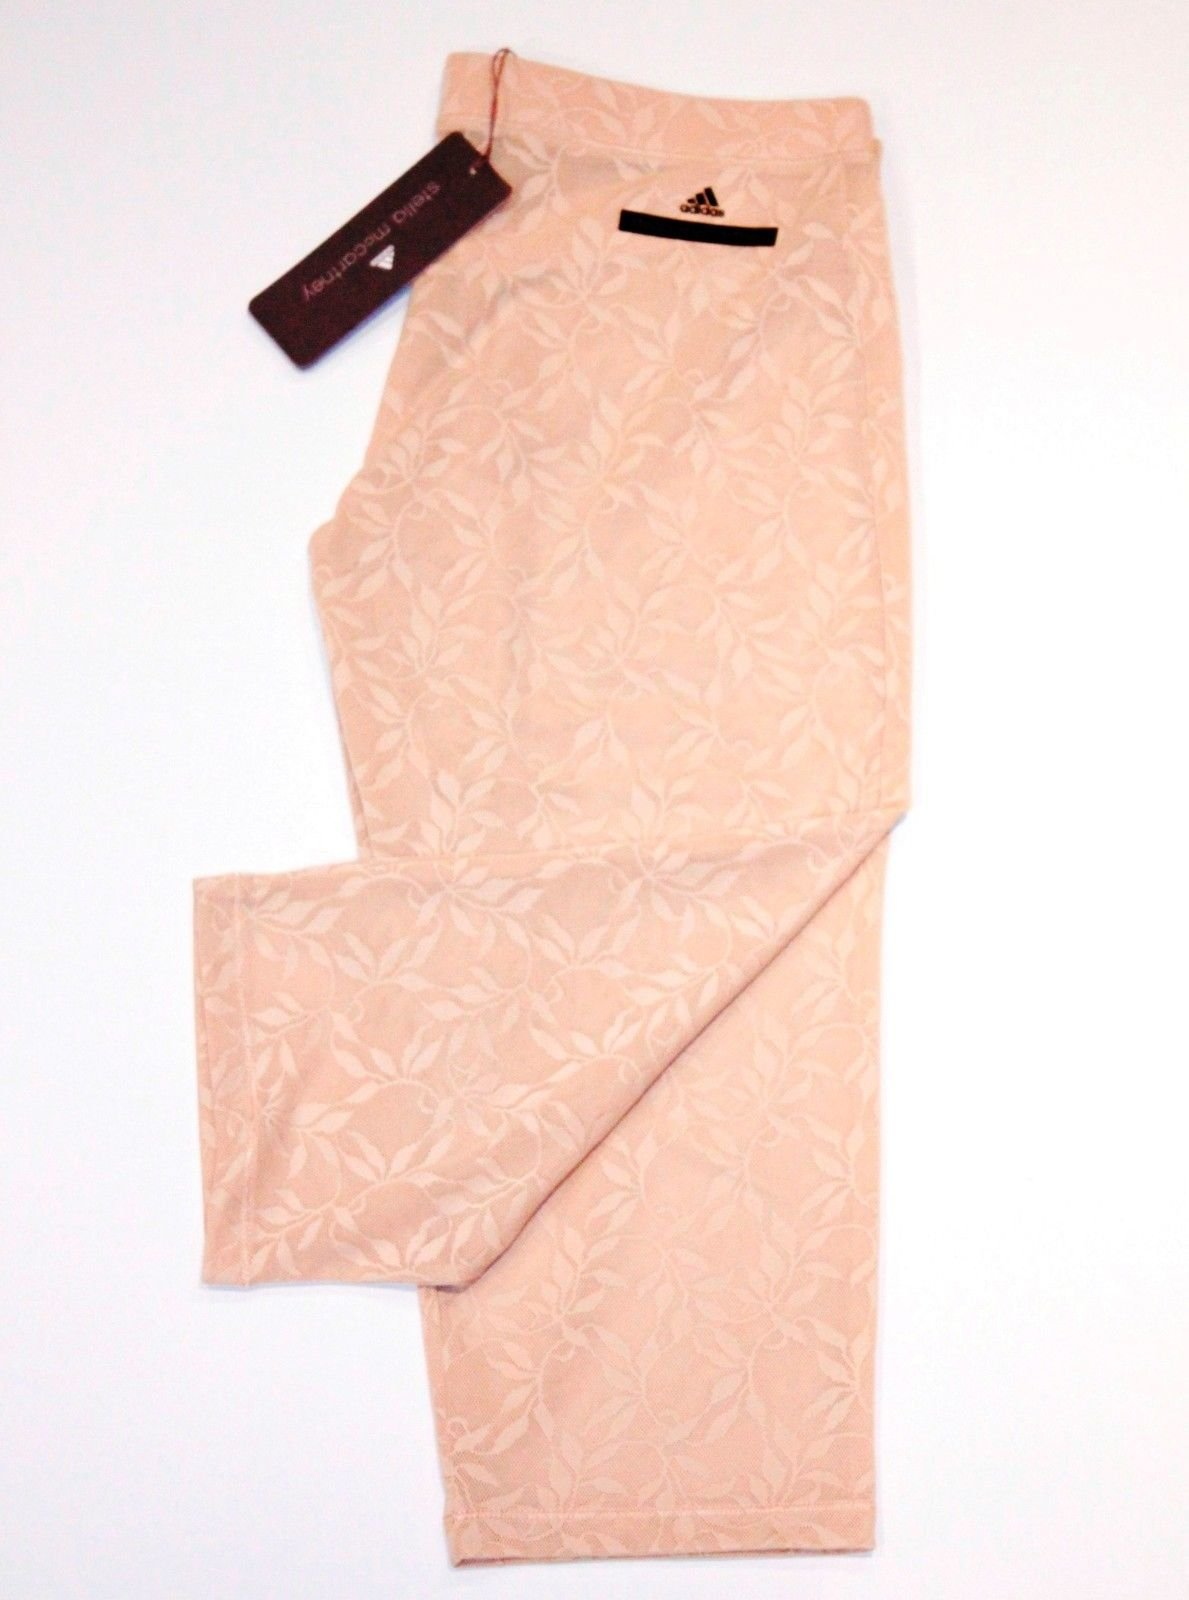 Adidas Stella Mccartney Women's P49197 Lace Tights, Bare, M by adidas